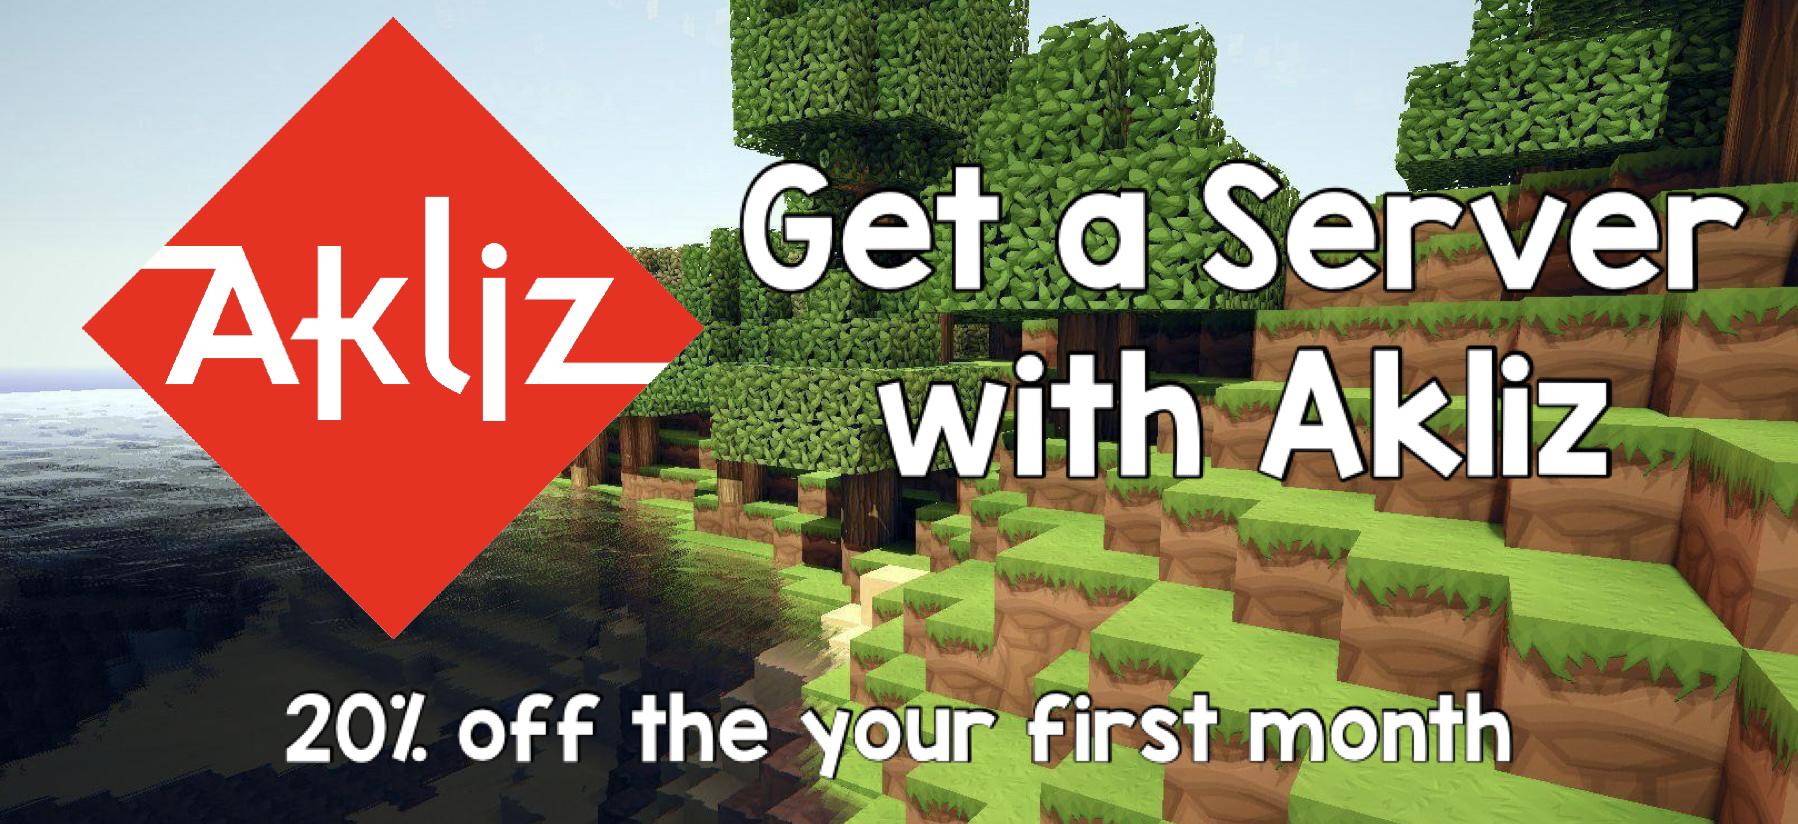 Get a Server with Akliz